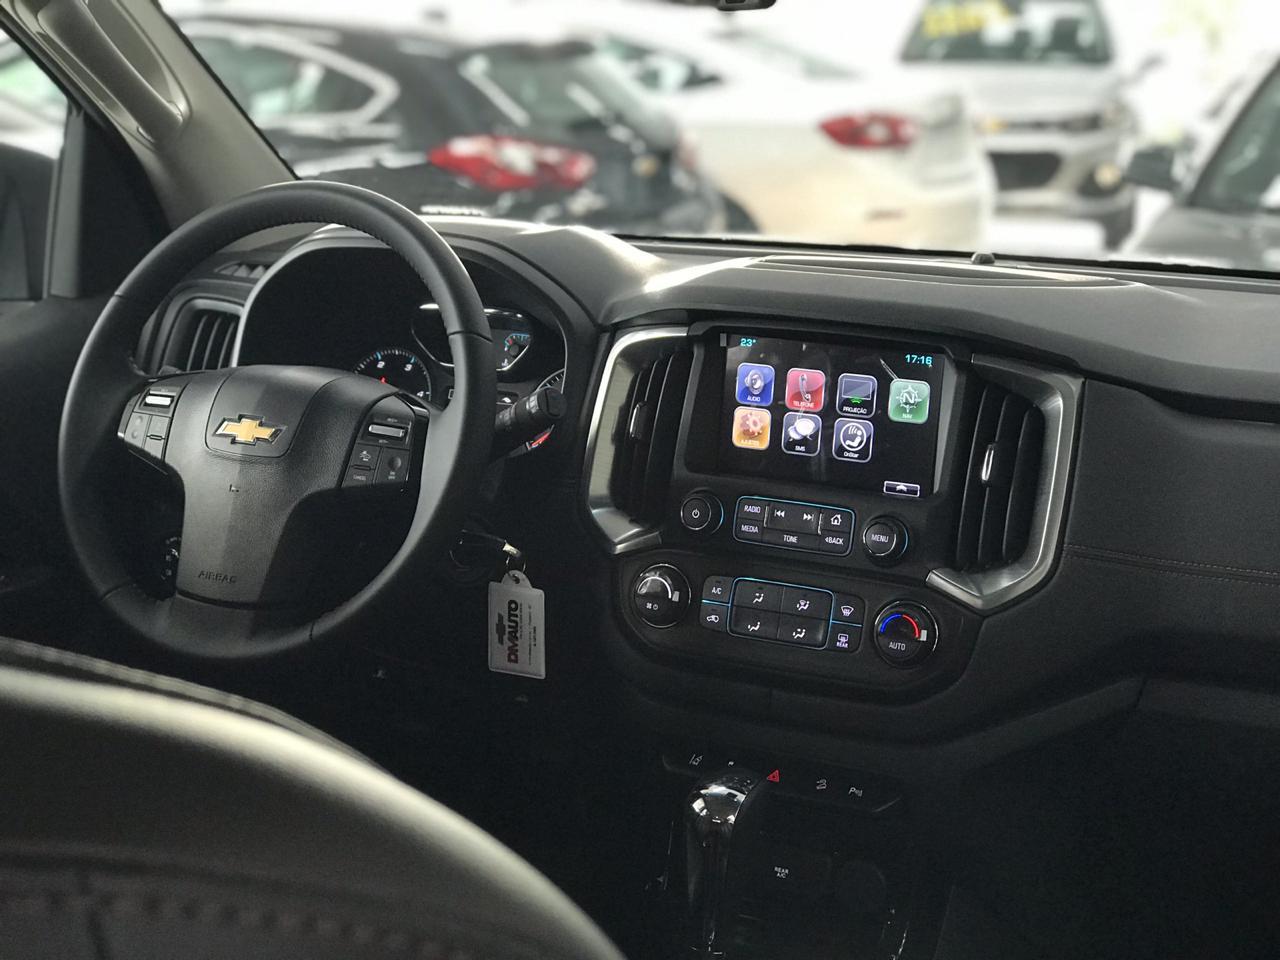 Chevrolet TRAILBLAZER LTZ D4A ZERO KM 2.8 2019